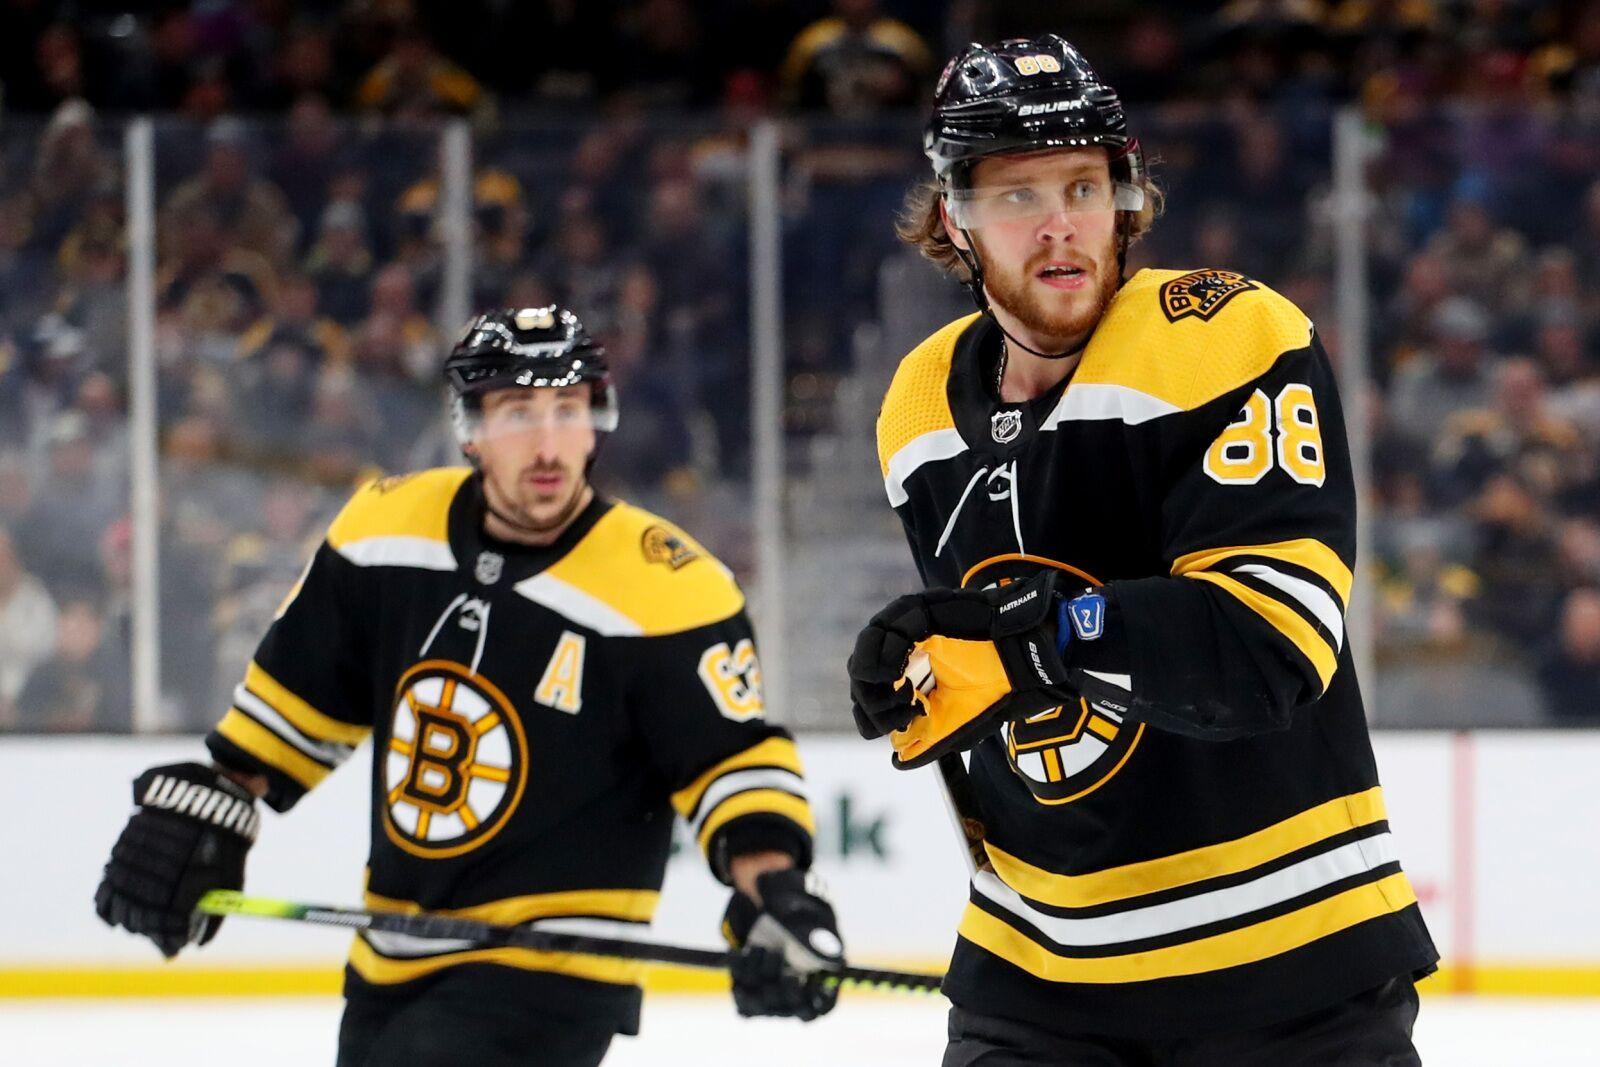 Boston Bruins: Upcoming road trip presents a big challenge